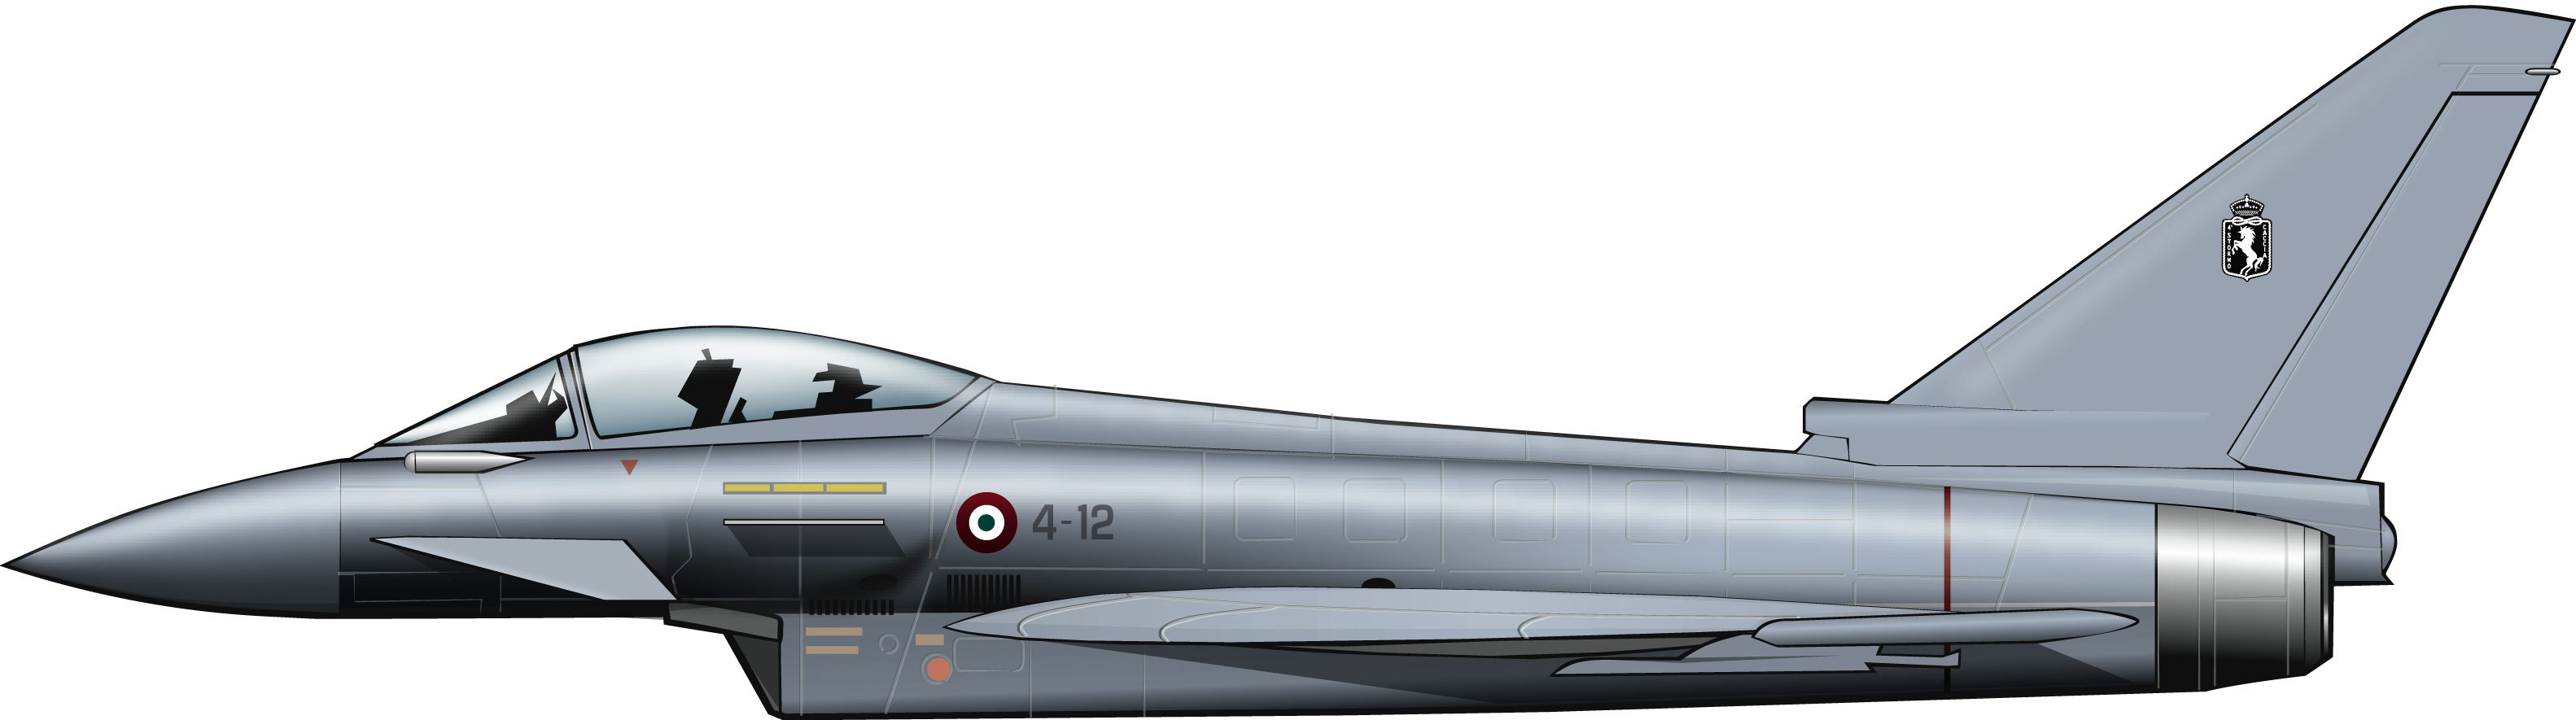 eadseurofighteraustria2008